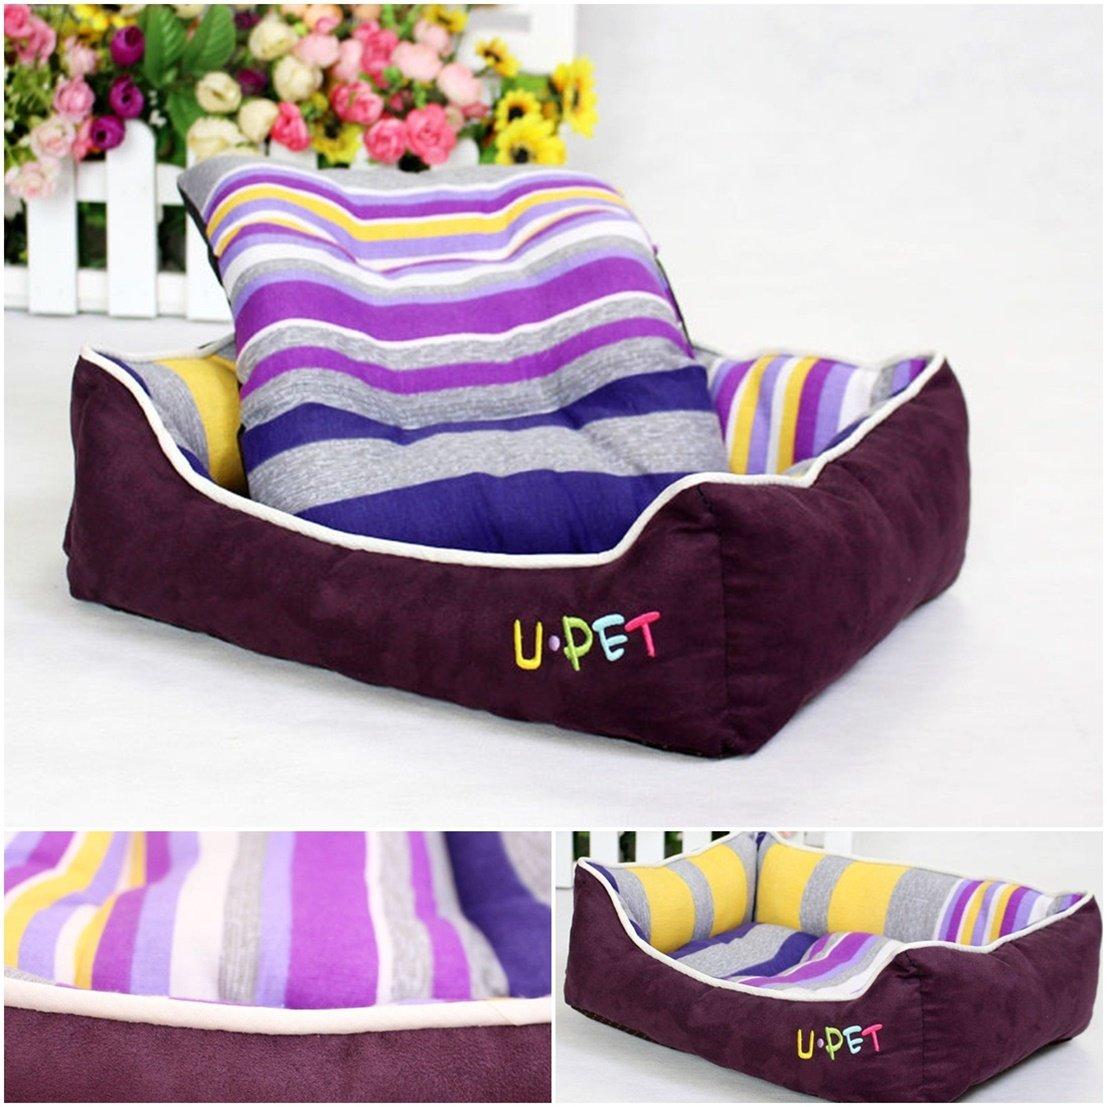 1Pc First-class Popular Pet Bed Size L Nest Pad Furniture Cat Mat Color Purple